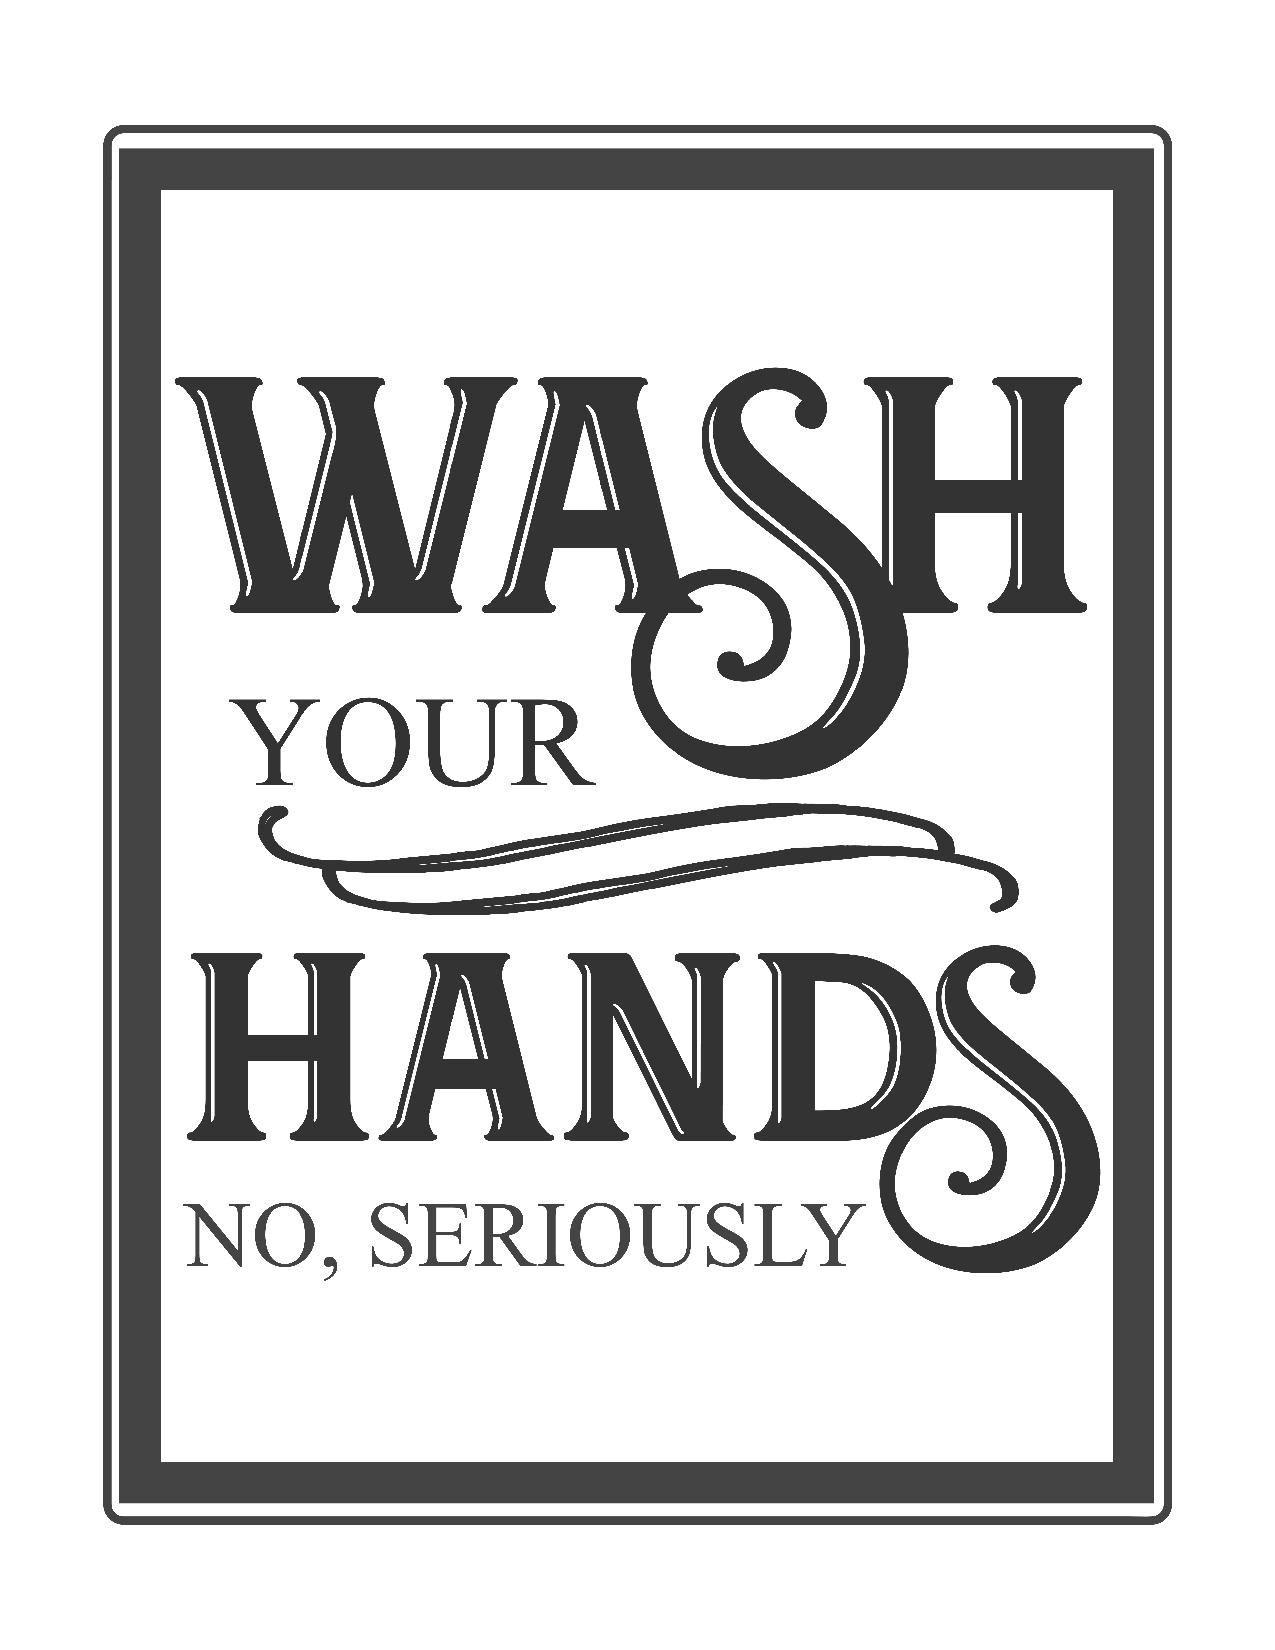 Free Vintage Bathroom Printables   Printables **   Vintage Bathrooms - Free Wash Your Hands Signs Printable